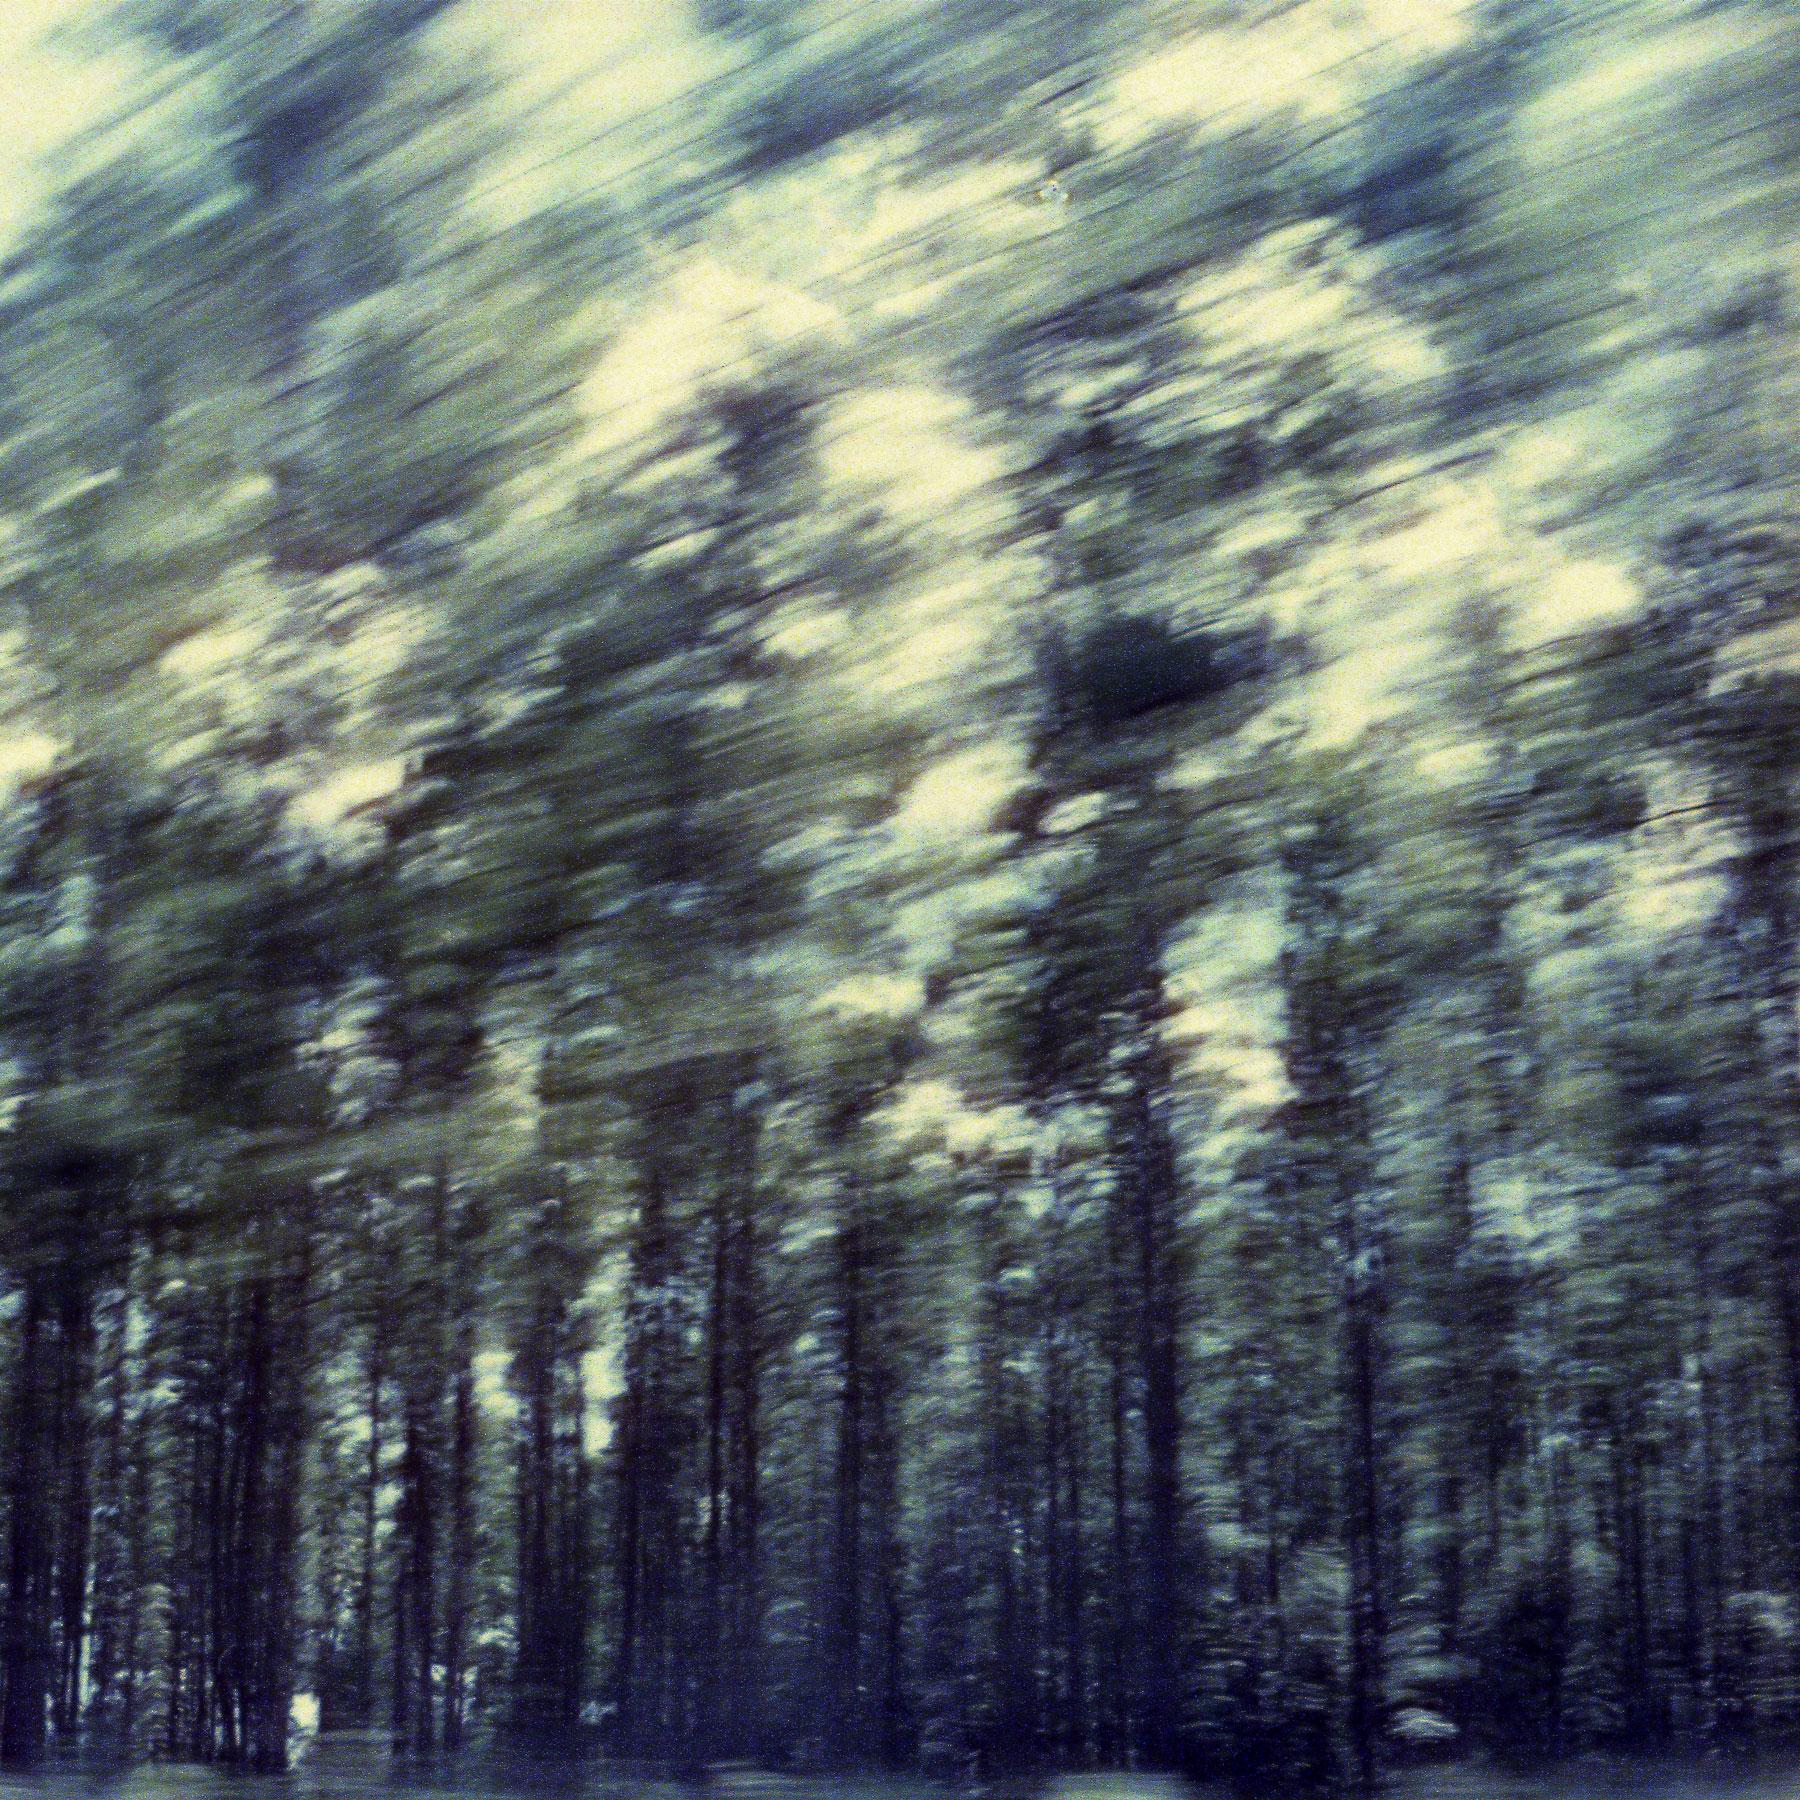 Ruby Berry | Flight | Leicaflex SL | Cinestill 800